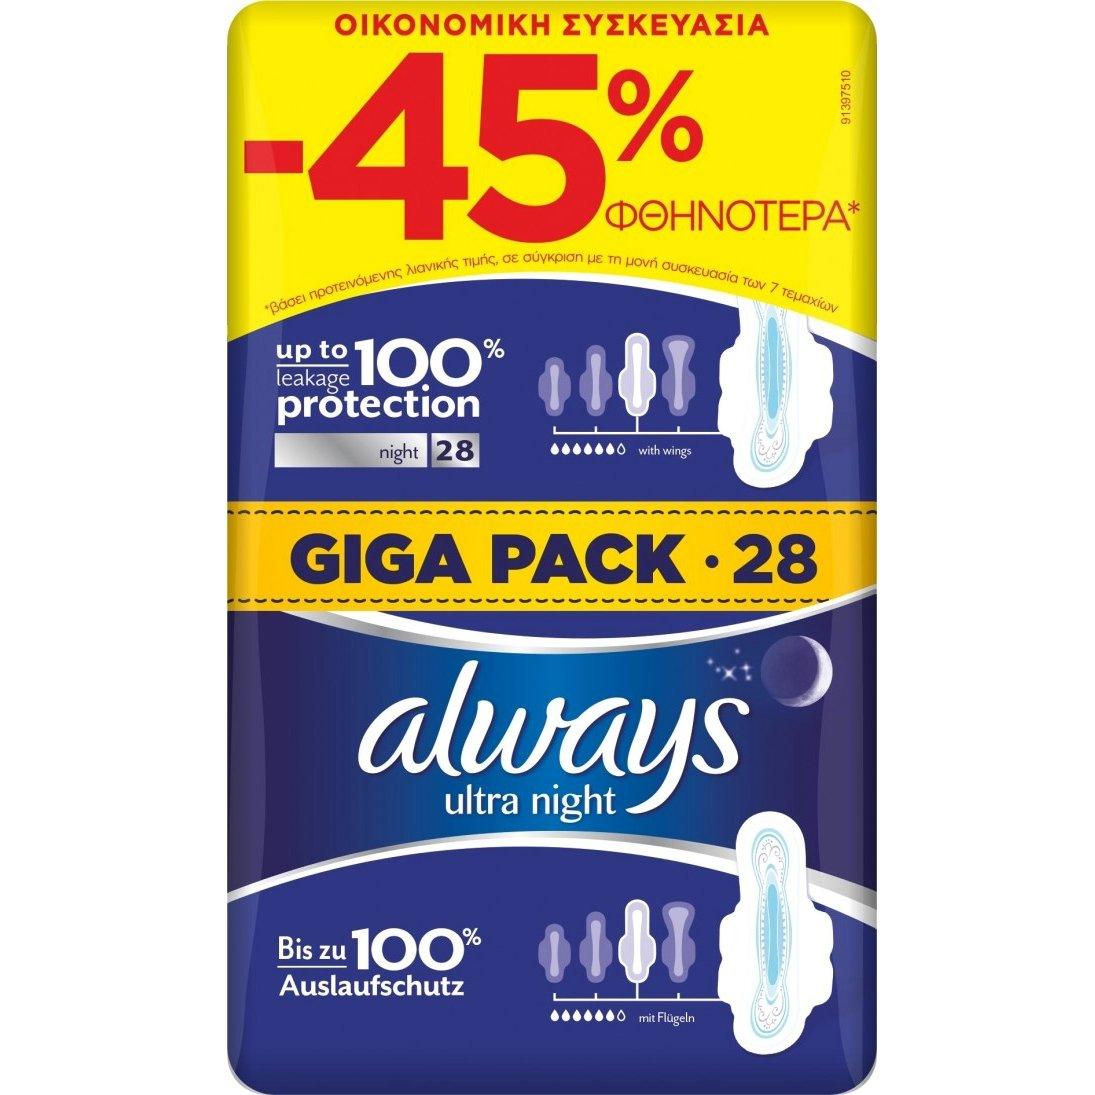 Always Πακέτο ΠροσφοράςUltra Night Giga PackΣερβιέτες 28 Τεμάχια